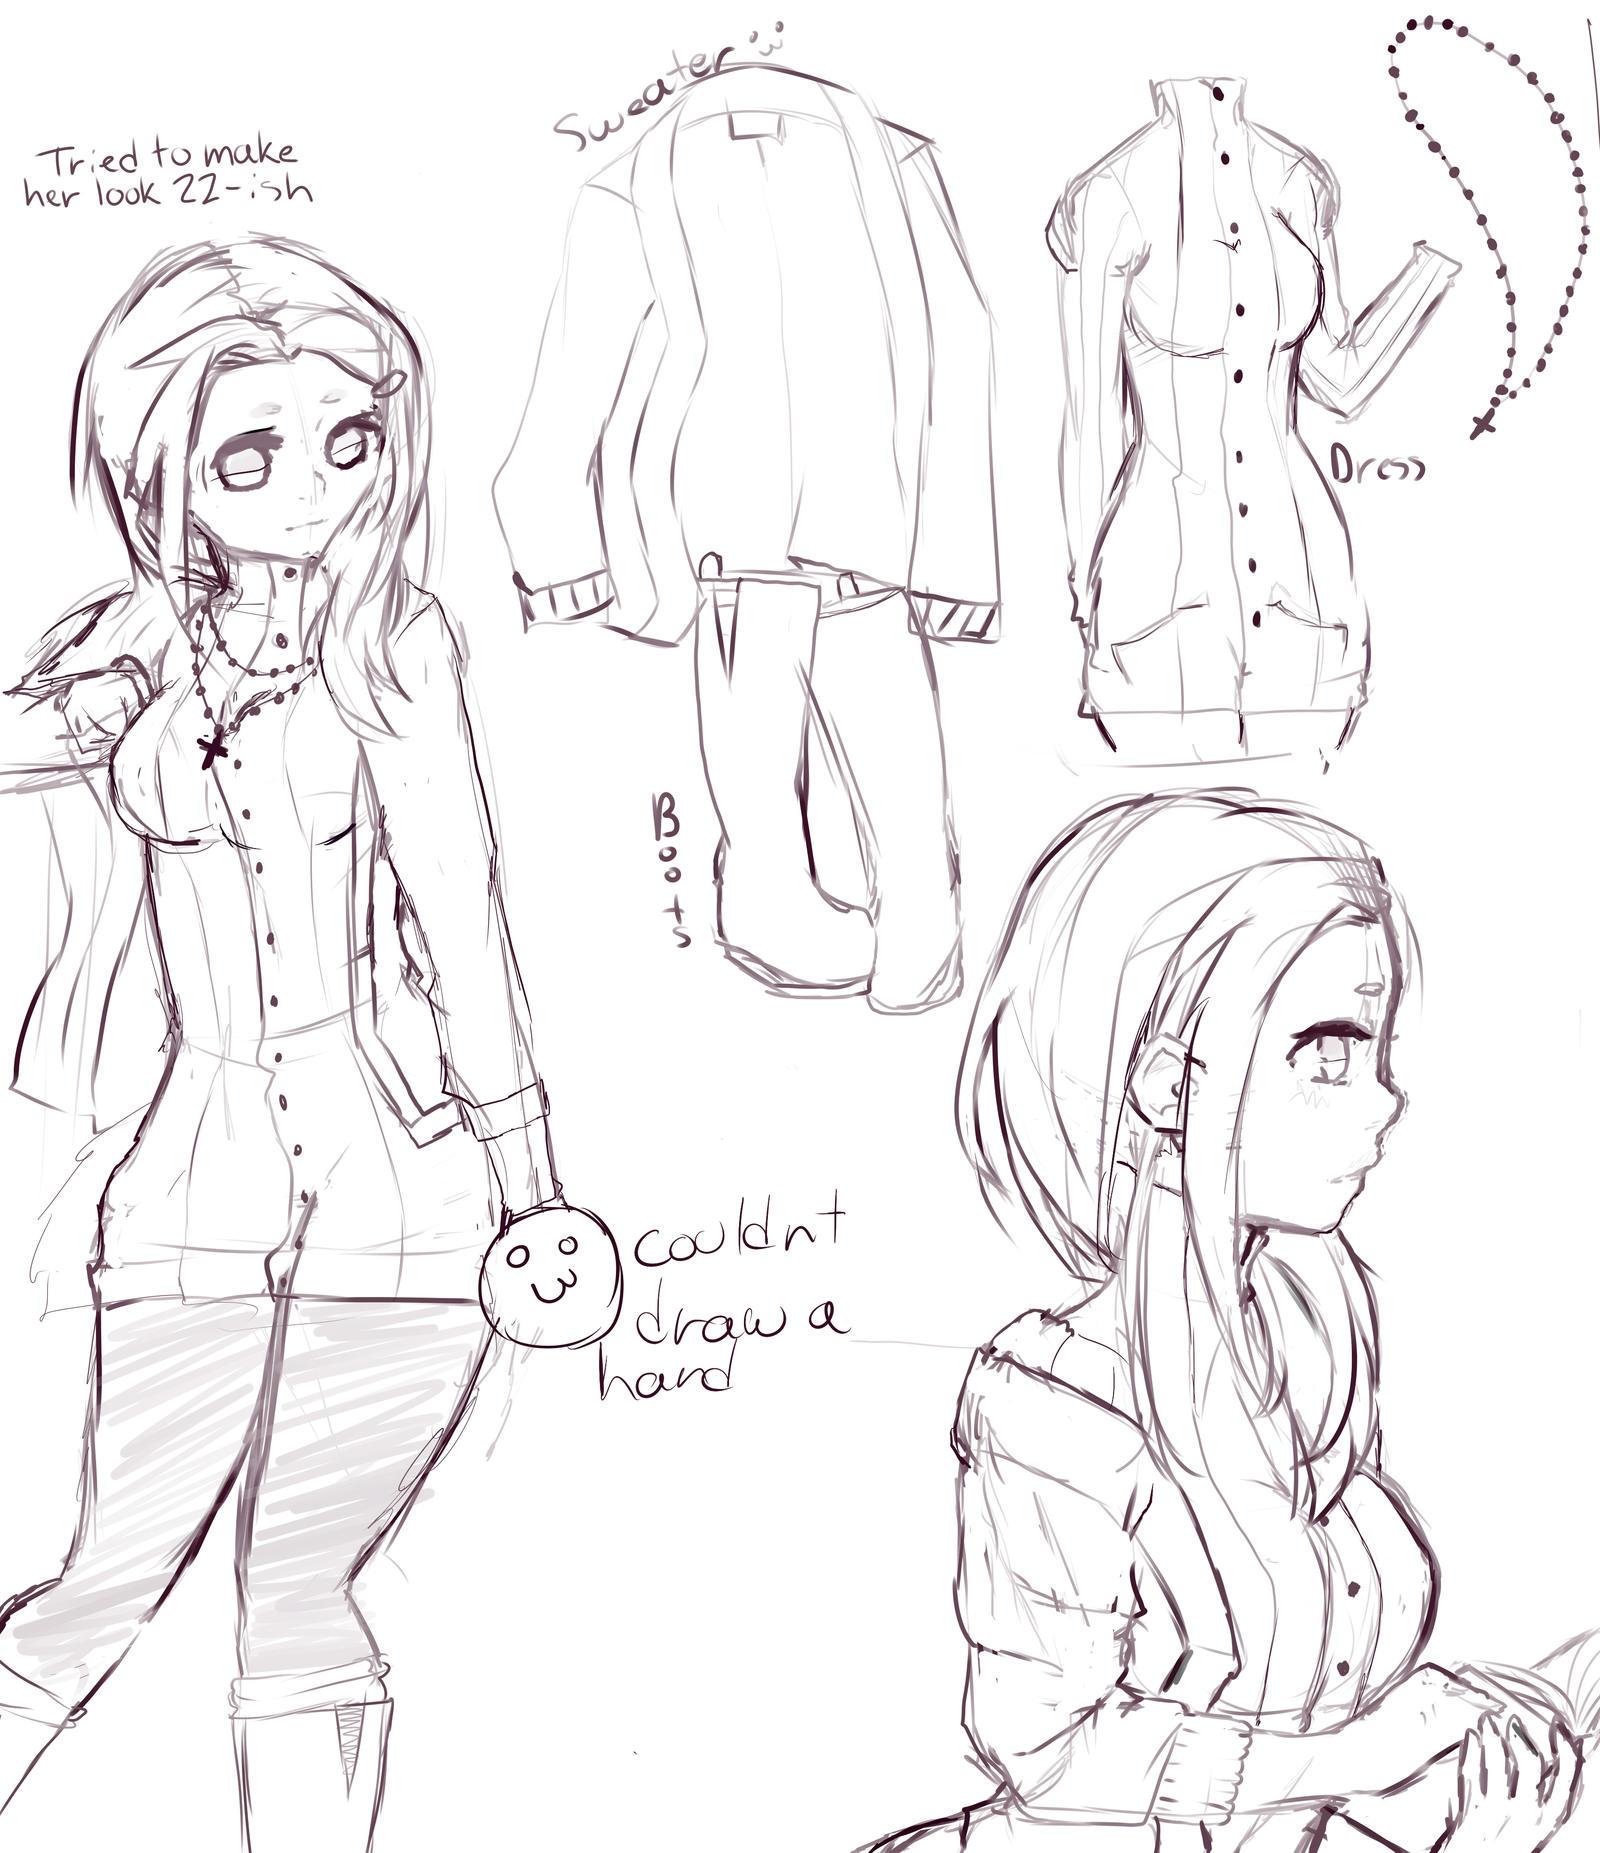 Character Design Kawaii : Cute nun character design by olliverpie on deviantart